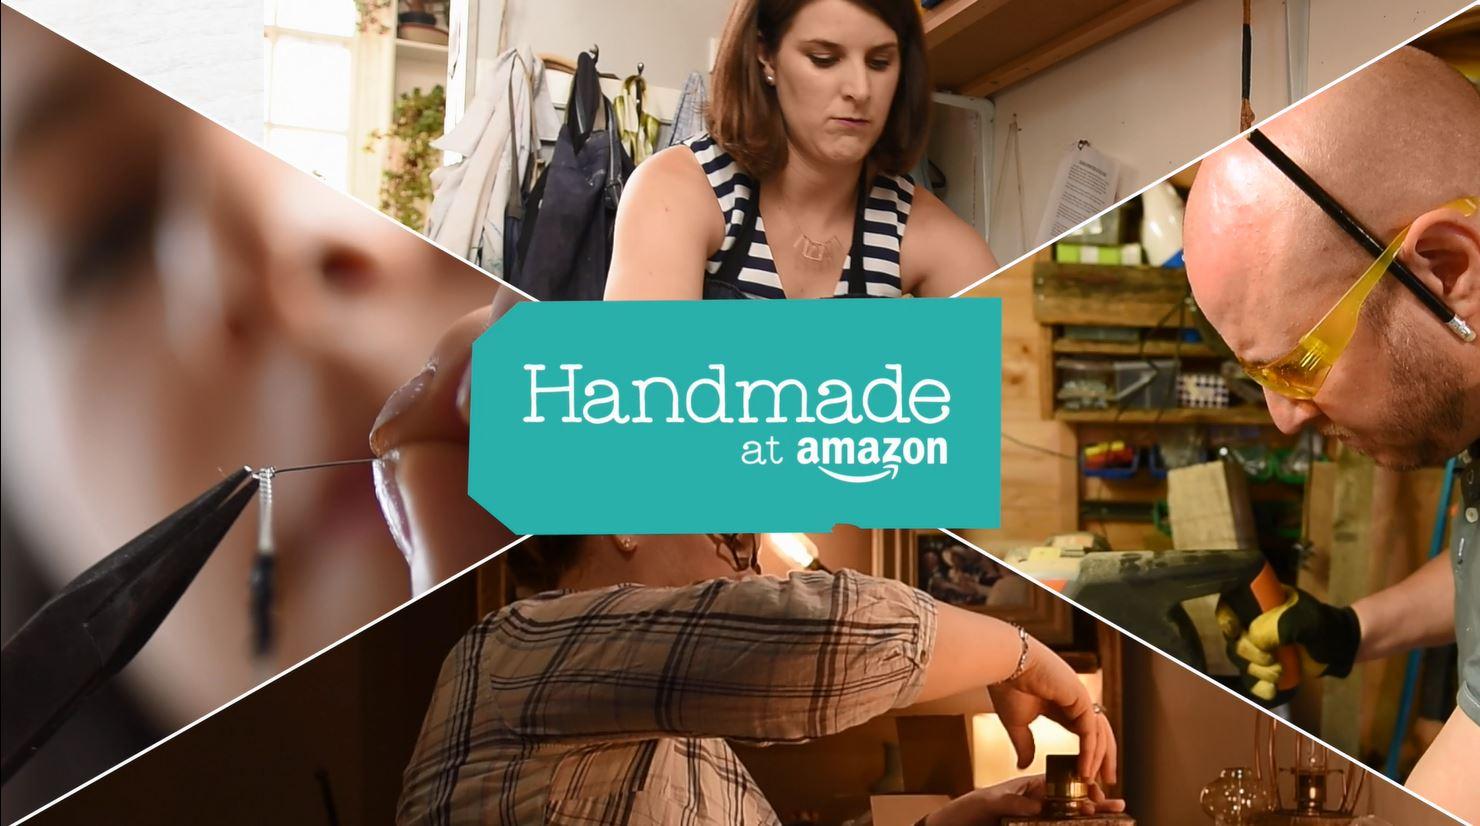 HandmadeAmazon